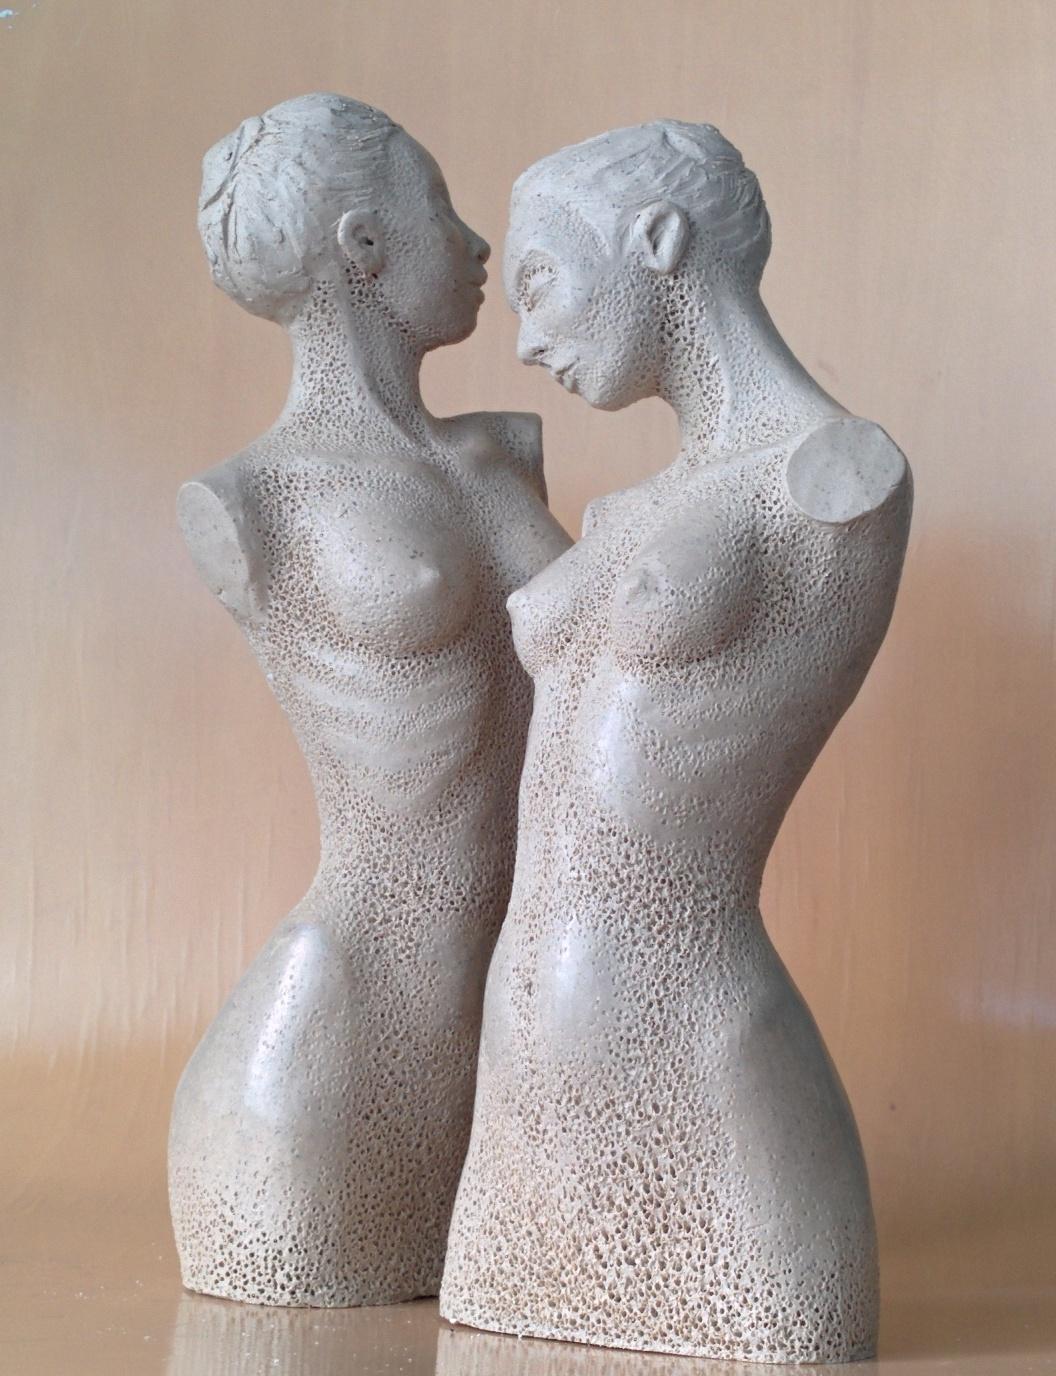 Small figurines